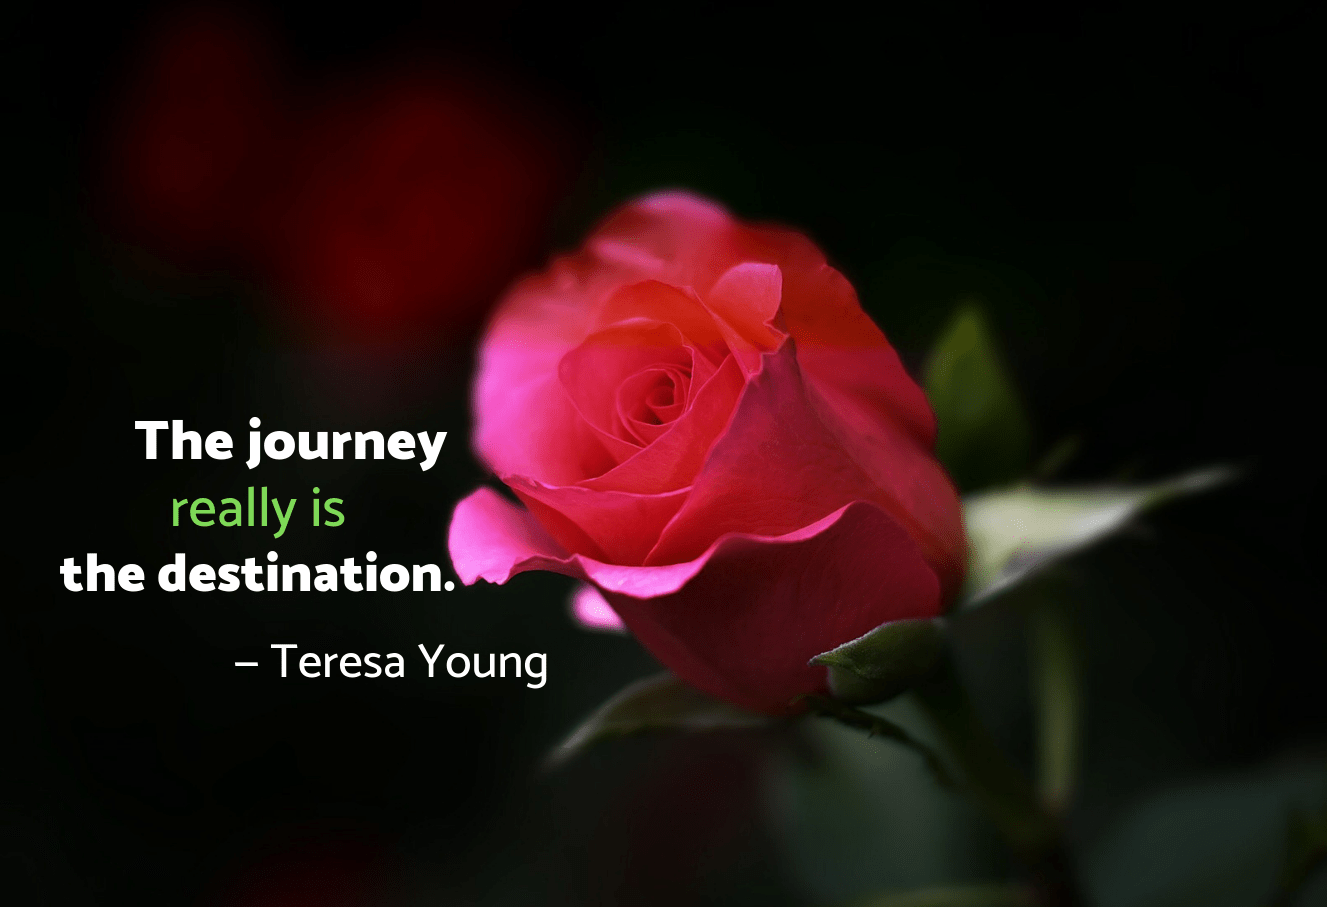 Life Coaching with Teresa Young